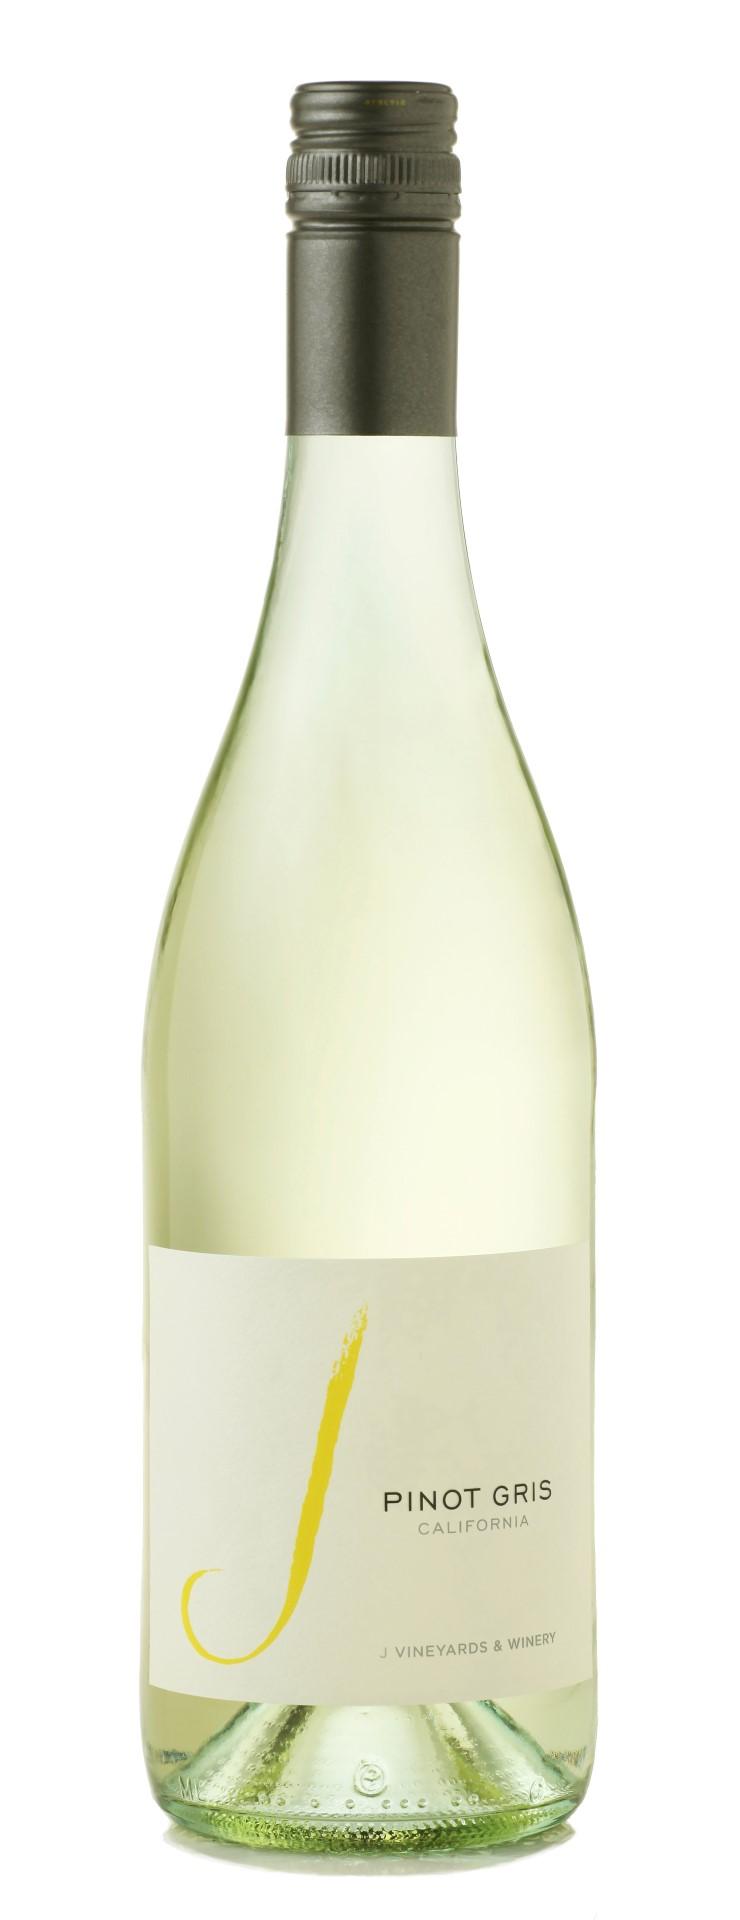 2016 J Vineyards Pinot Gris California